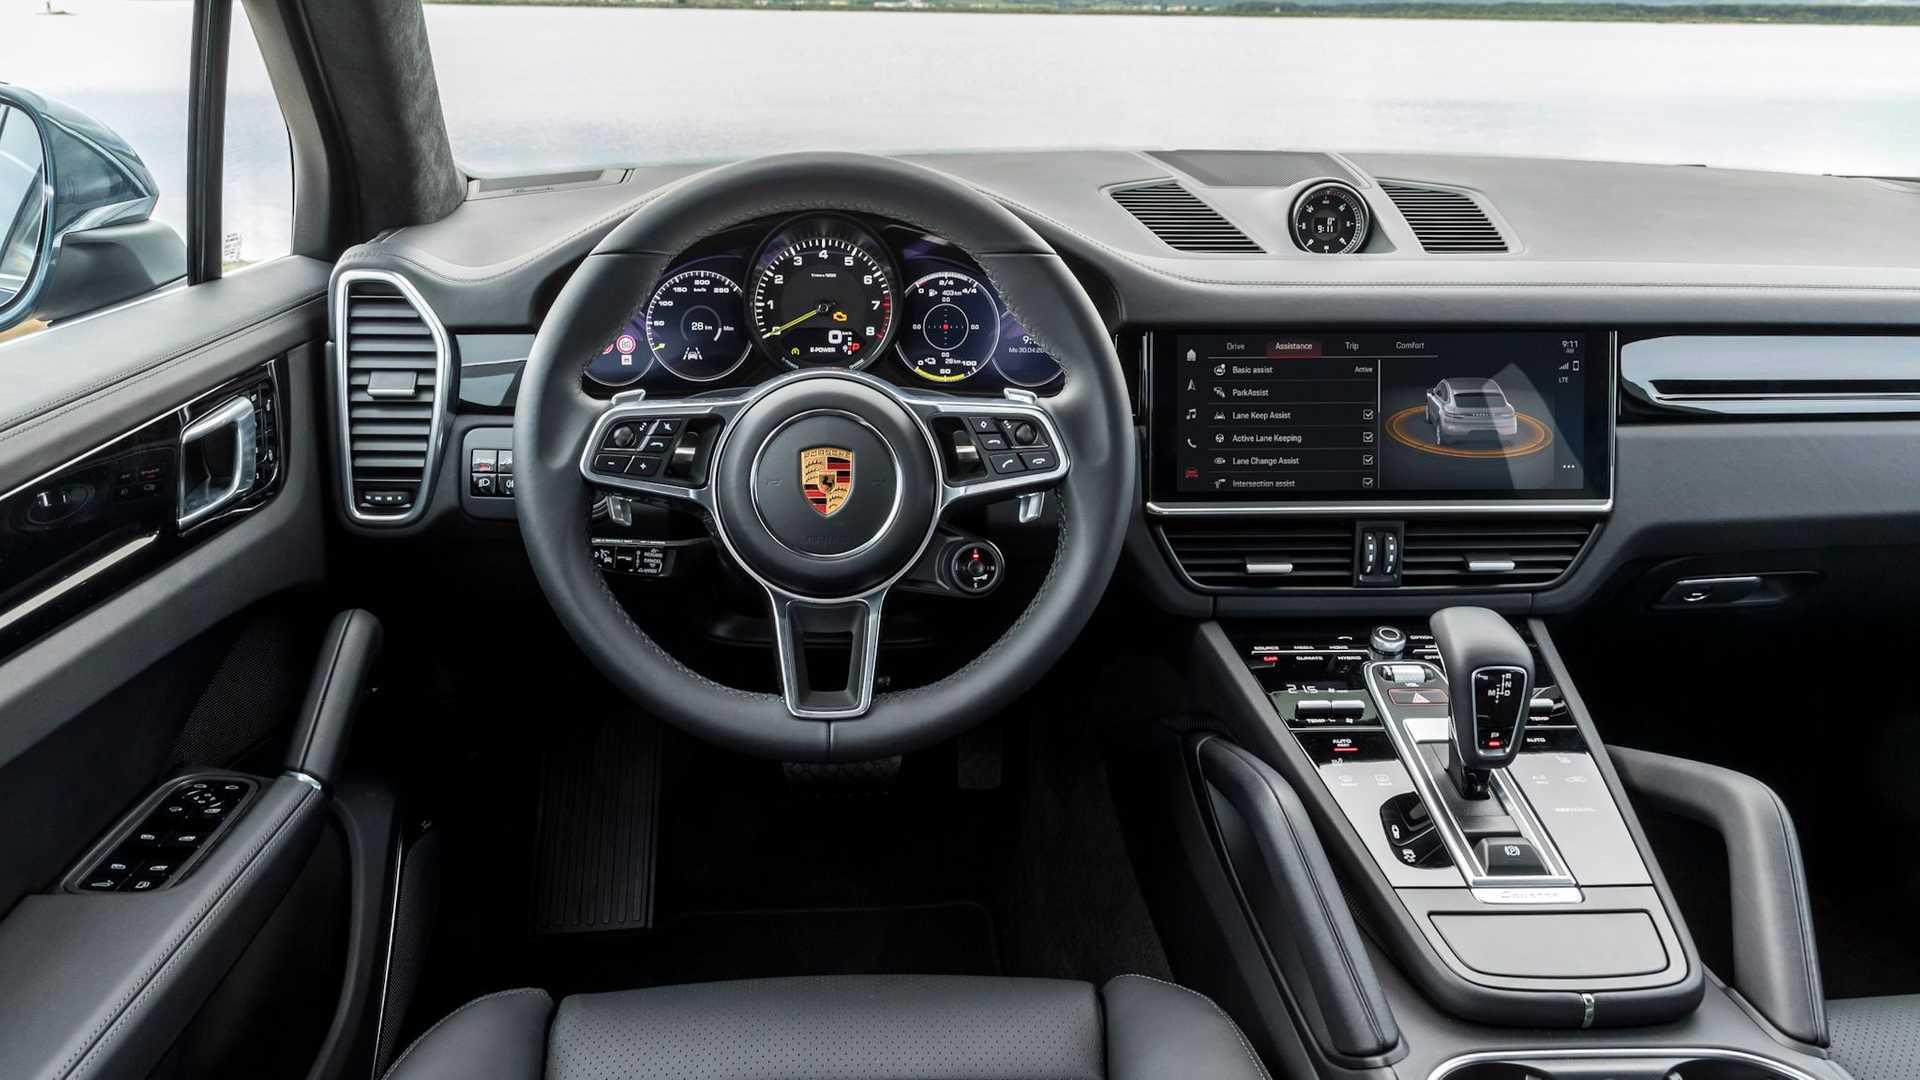 Porsche-Communication-Management-6-16